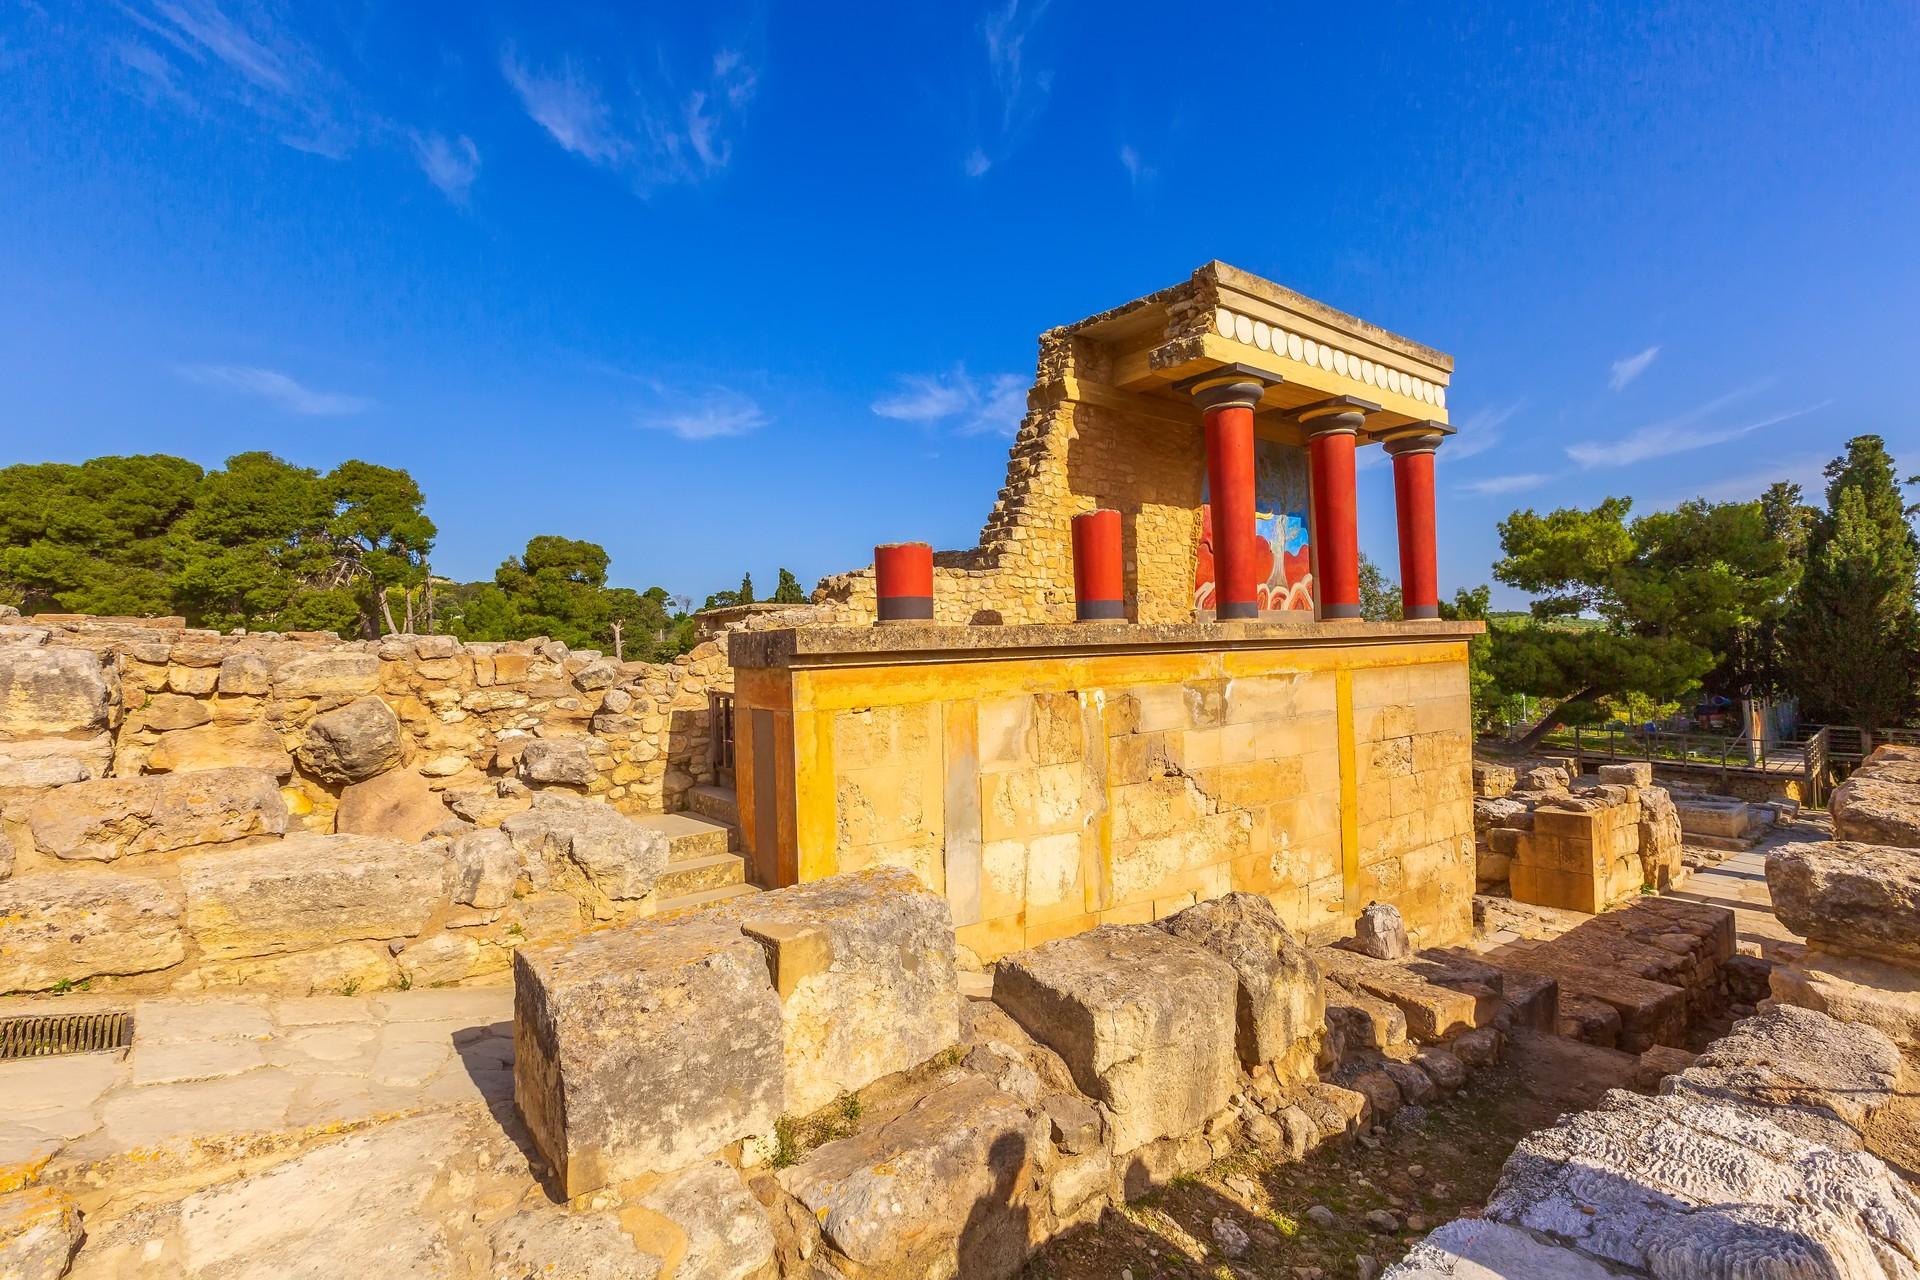 Knossos in Crete, Greece